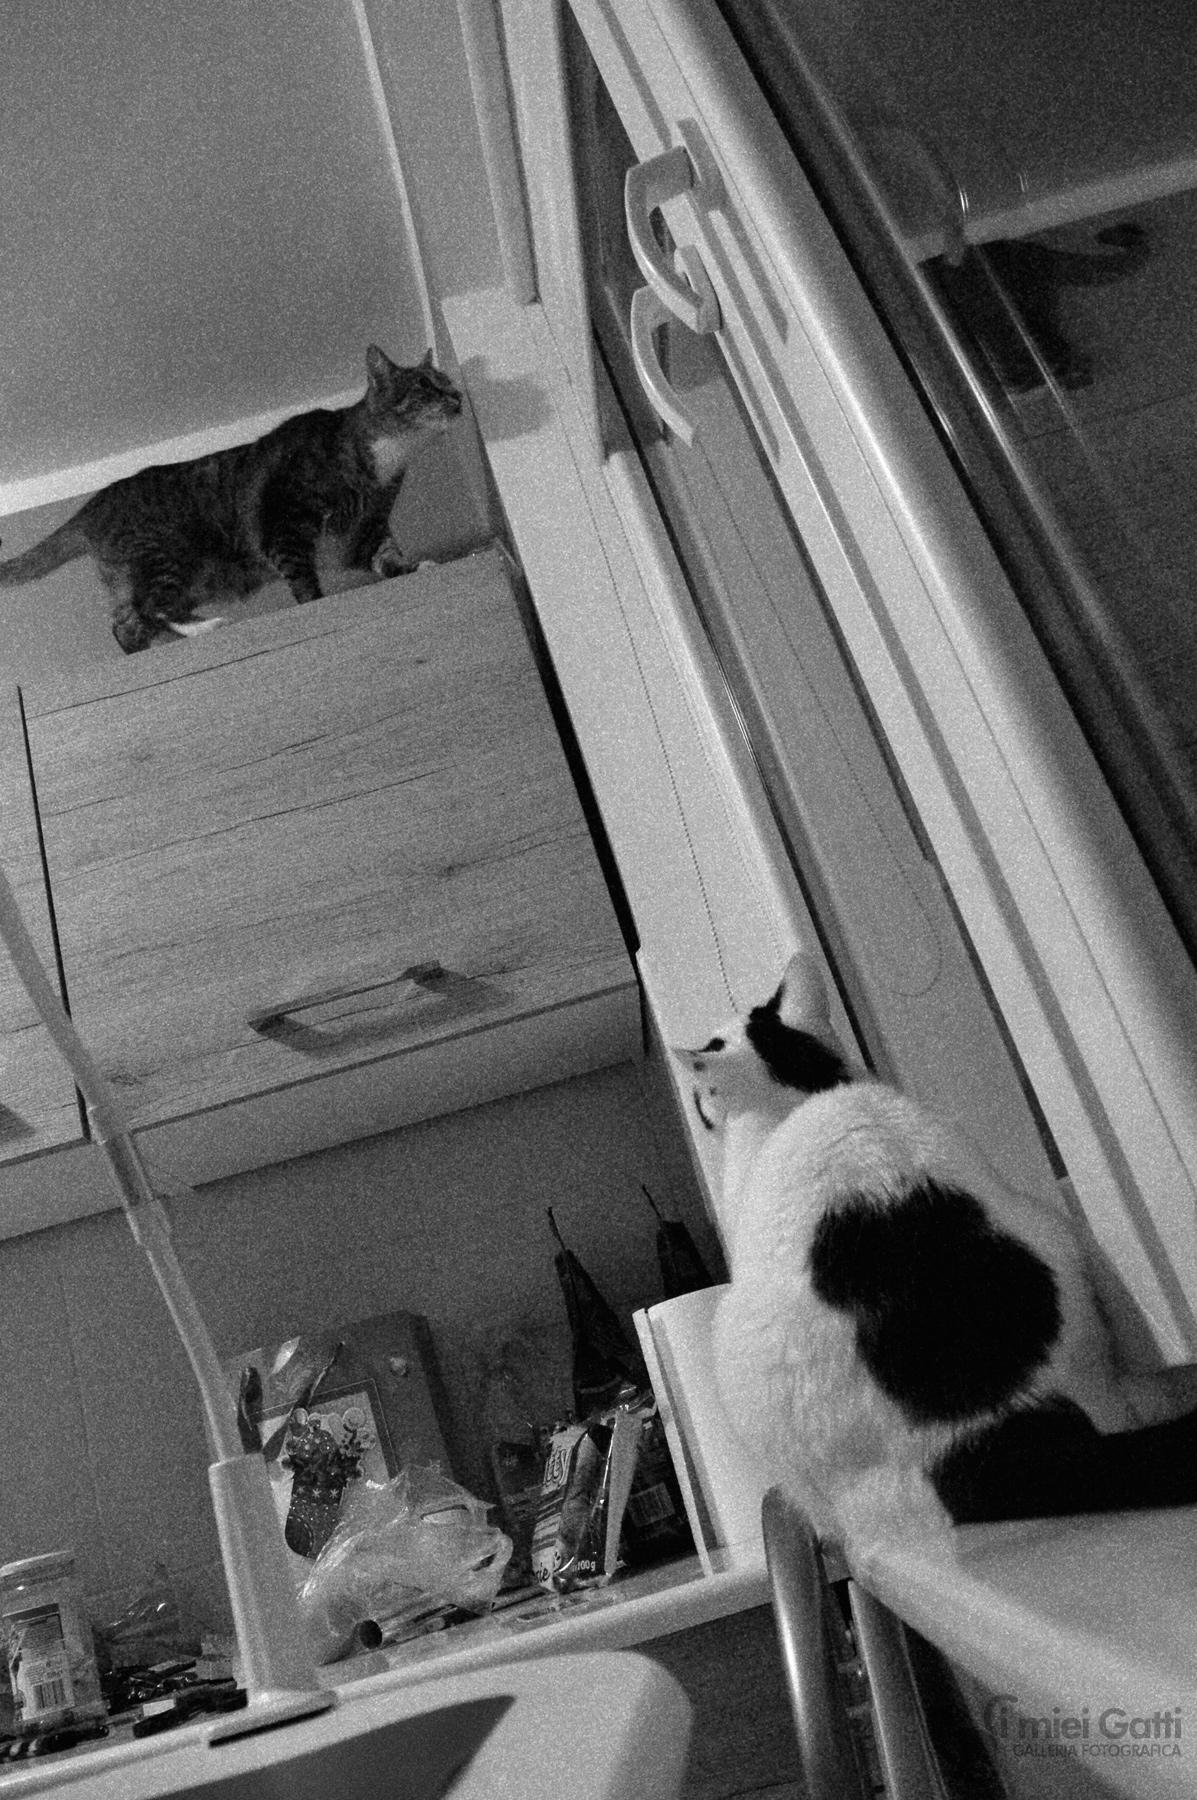 cosa stai facendo lì?